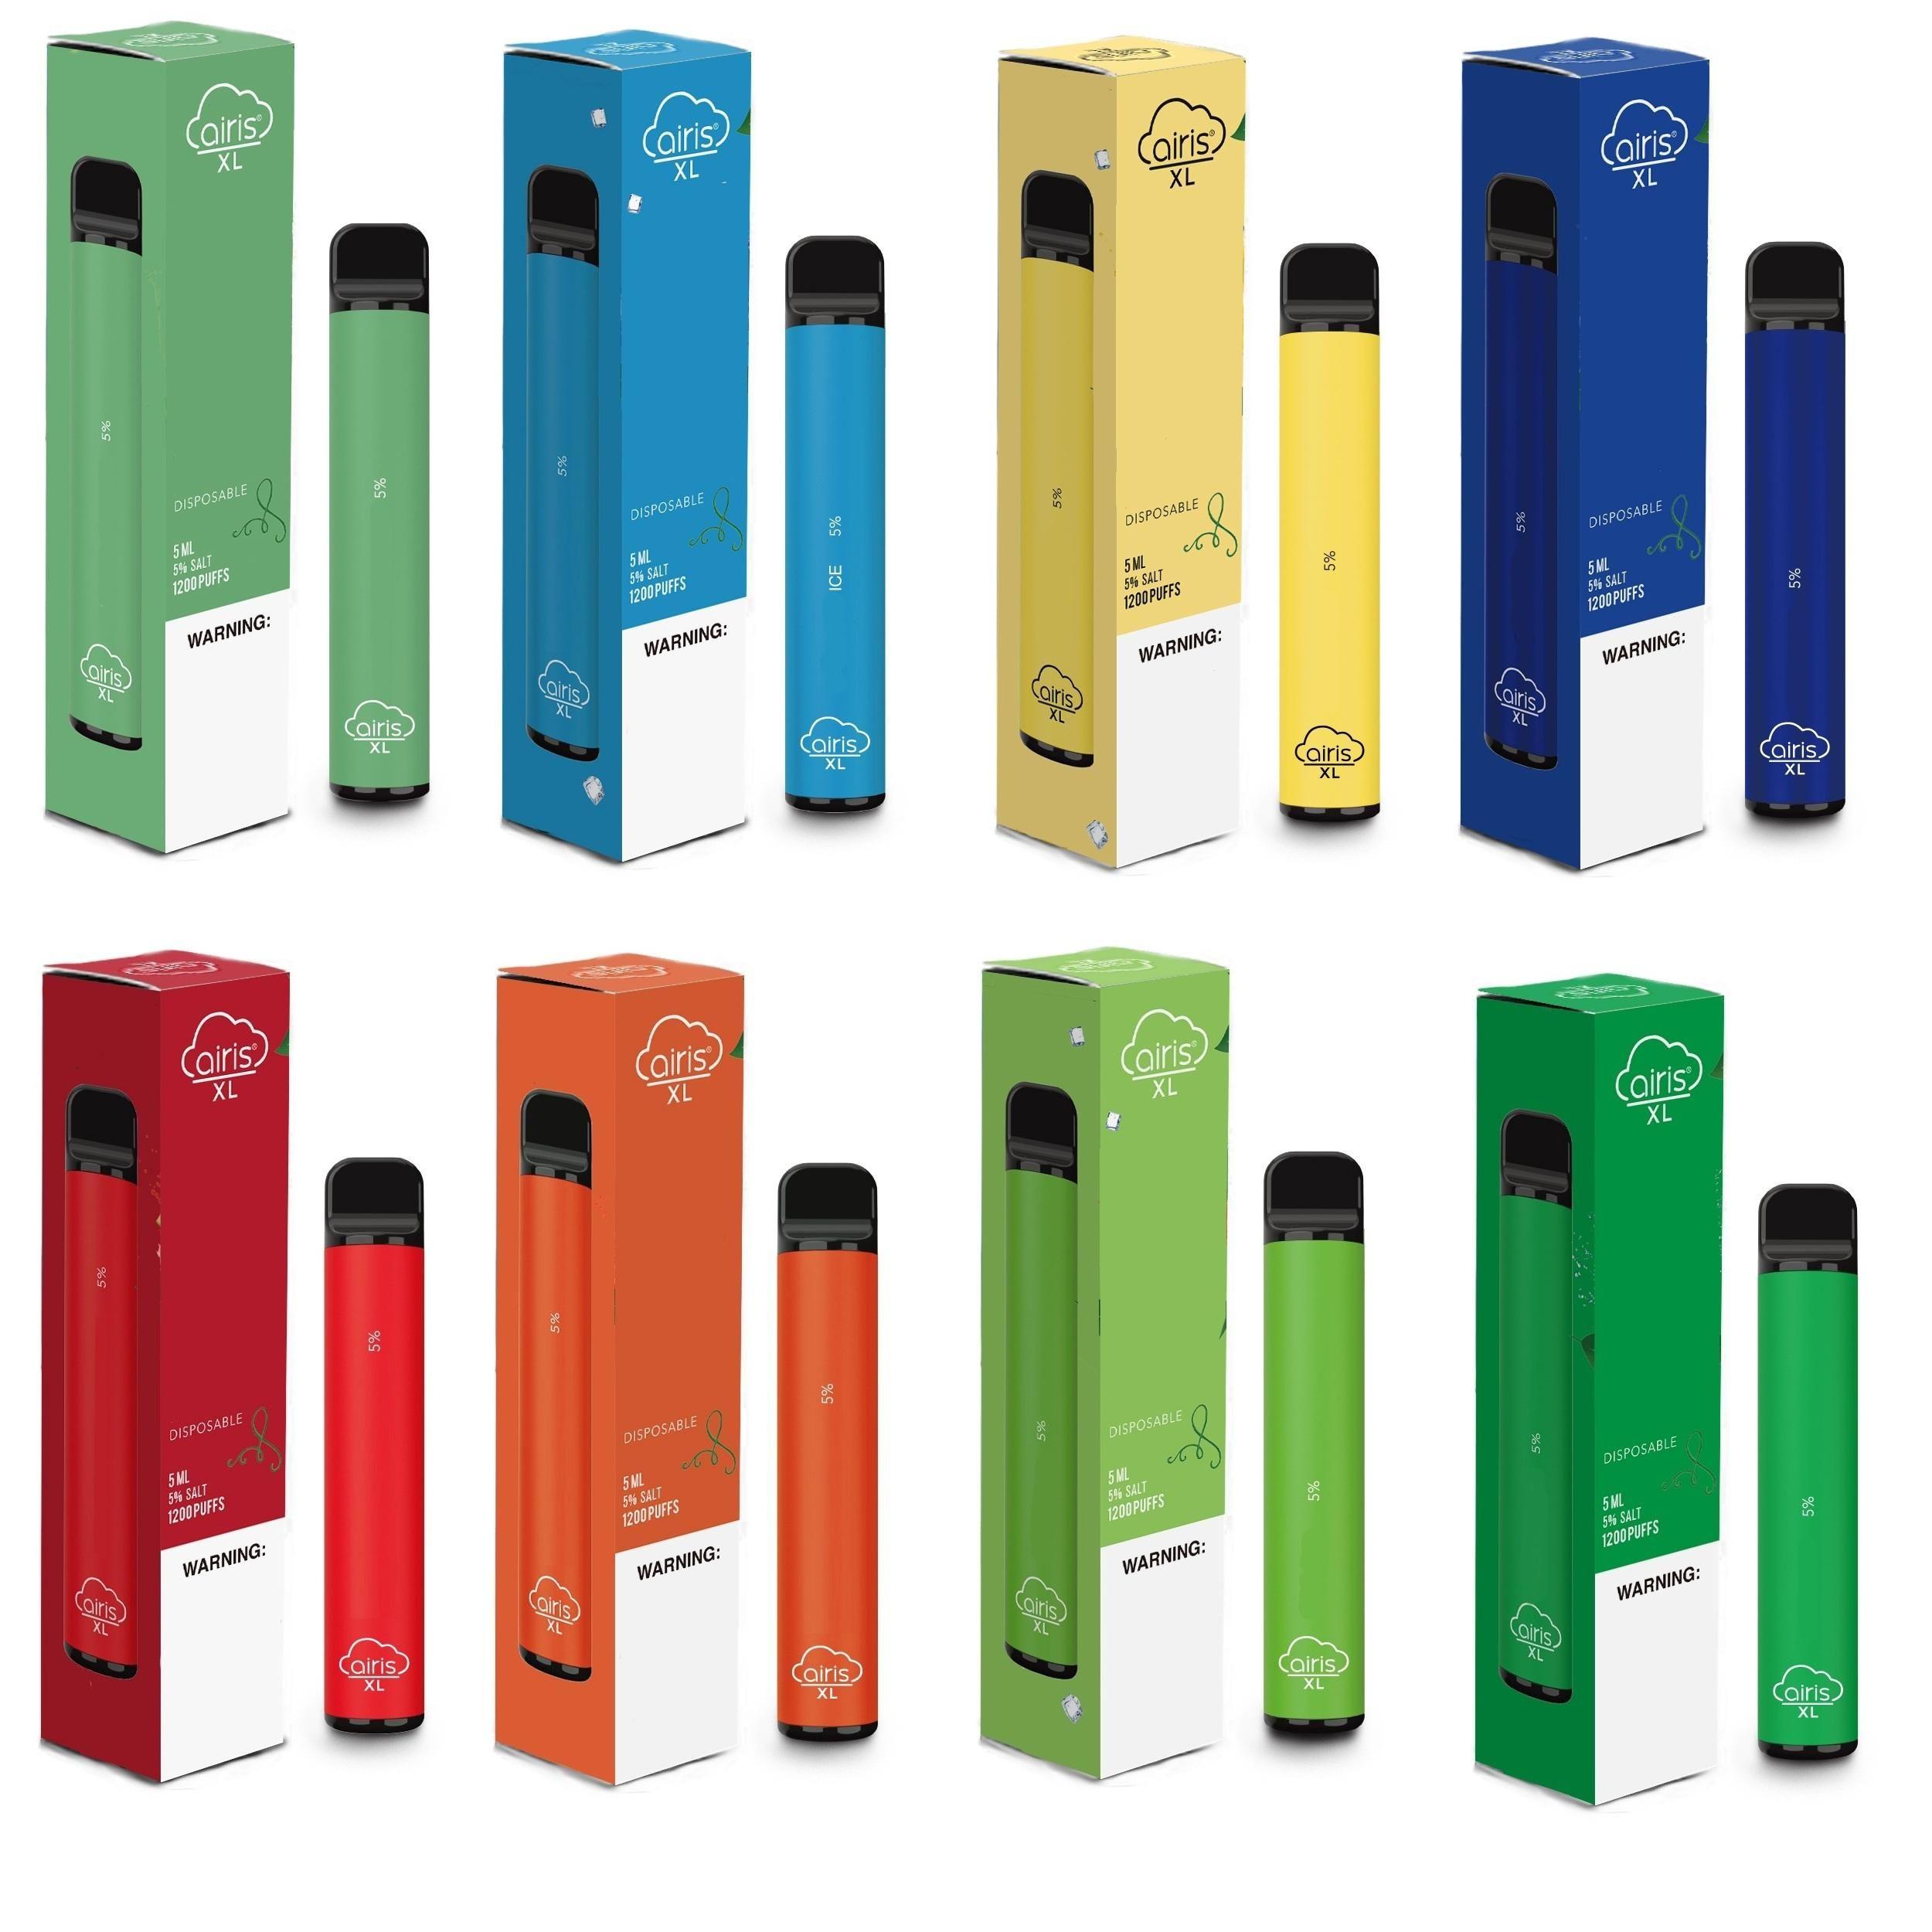 Orijinal Airis XL Tek Pod Cihaz Seti 1200 Puff 850mAh 5ml Prefilled Taşınabilir Vape Çubuk Kalem Bar Artı XXL Max% 100 Otantik 12 Renkler